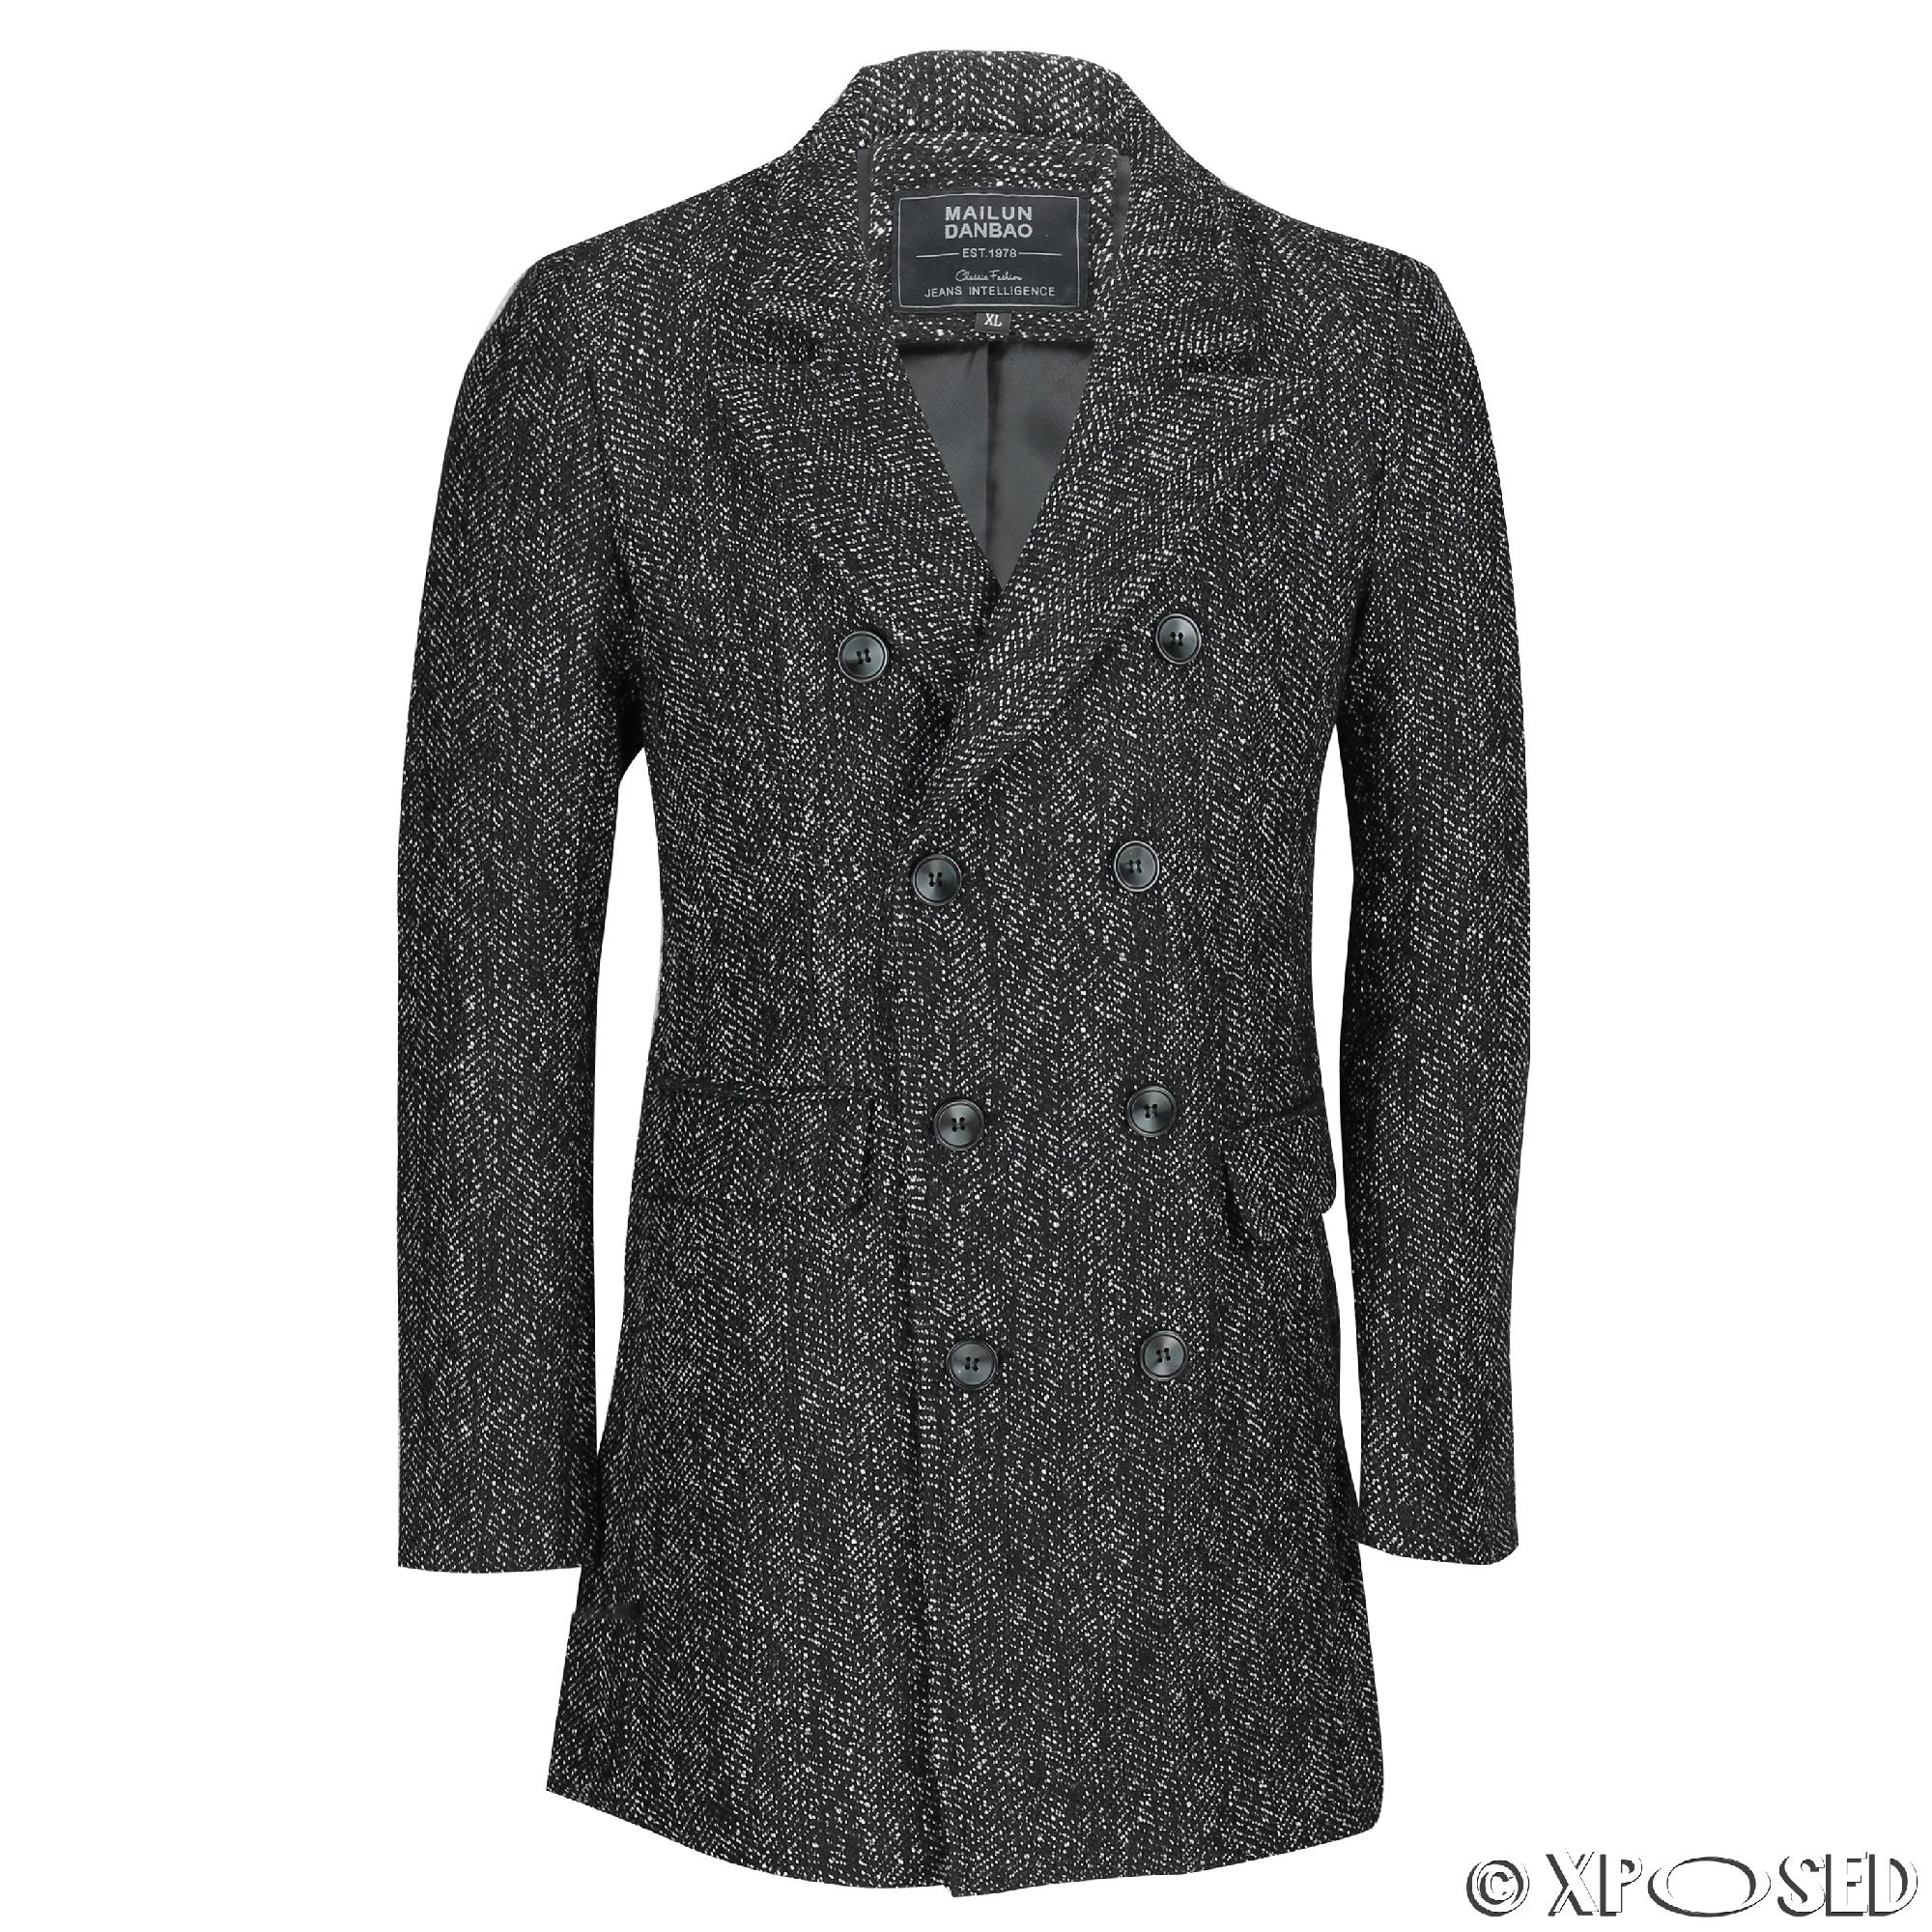 Details about Mens Black Grey Tweed Check Herringbone Double Breasted  Jacket Slim Fit Overcoat